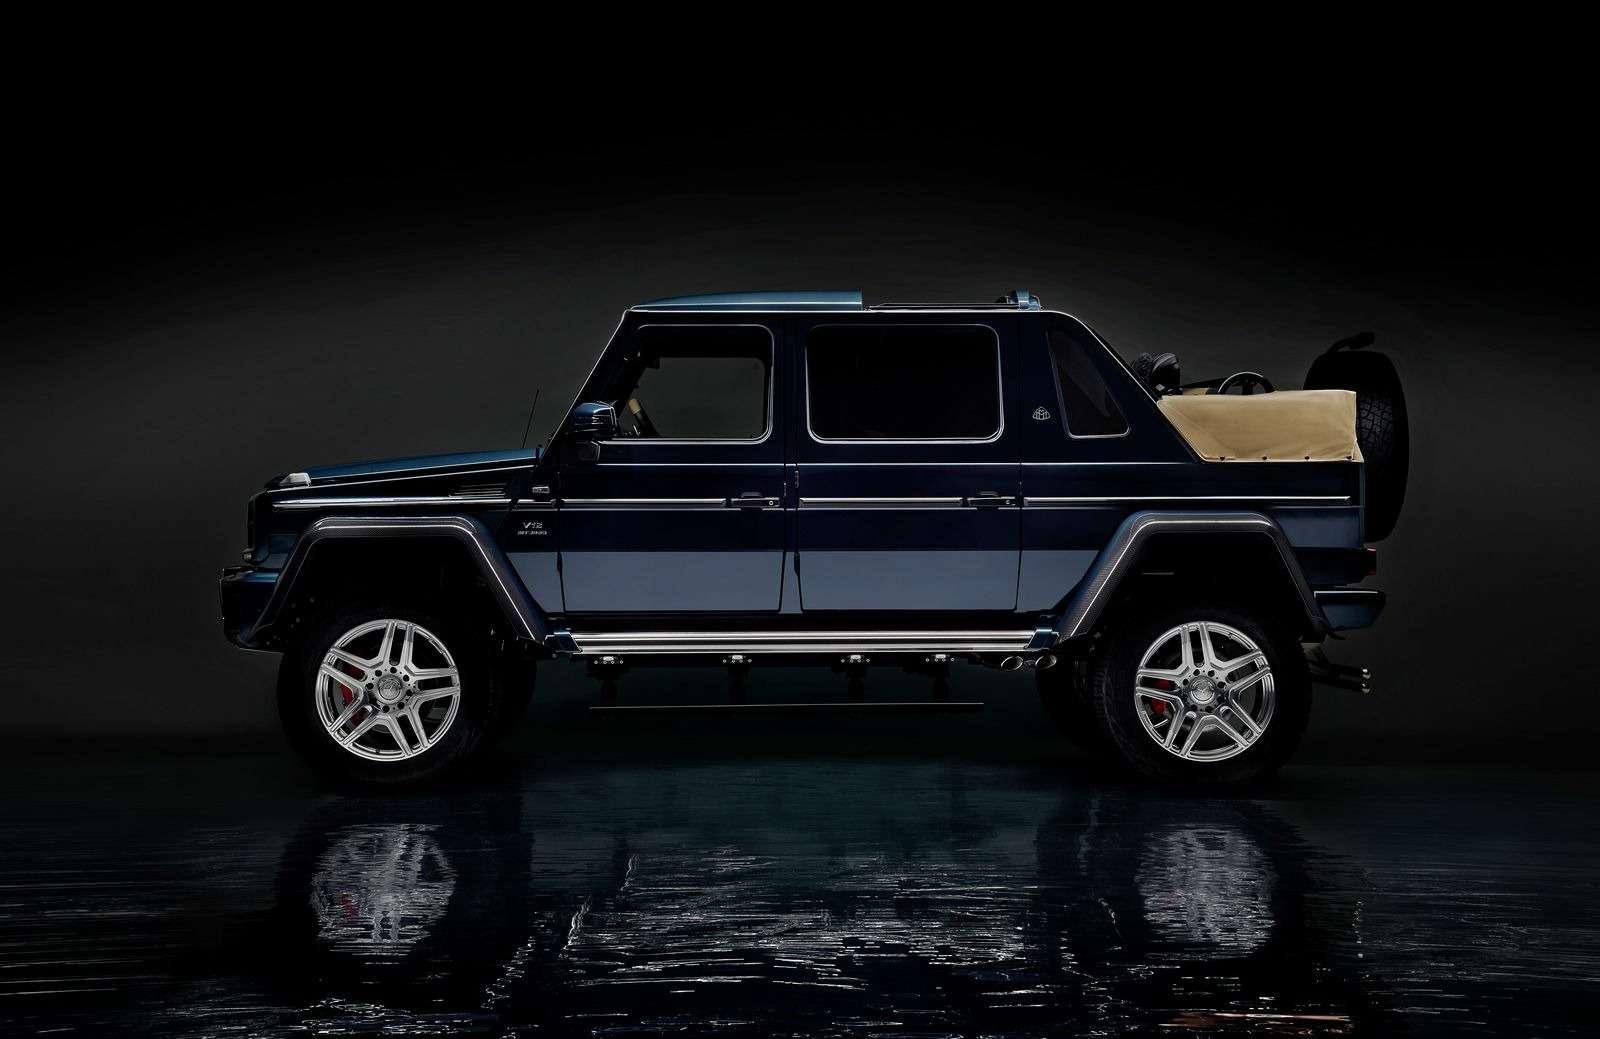 Mercedes-Maybach представил люксовый кабриолет G-класса— фото 706746